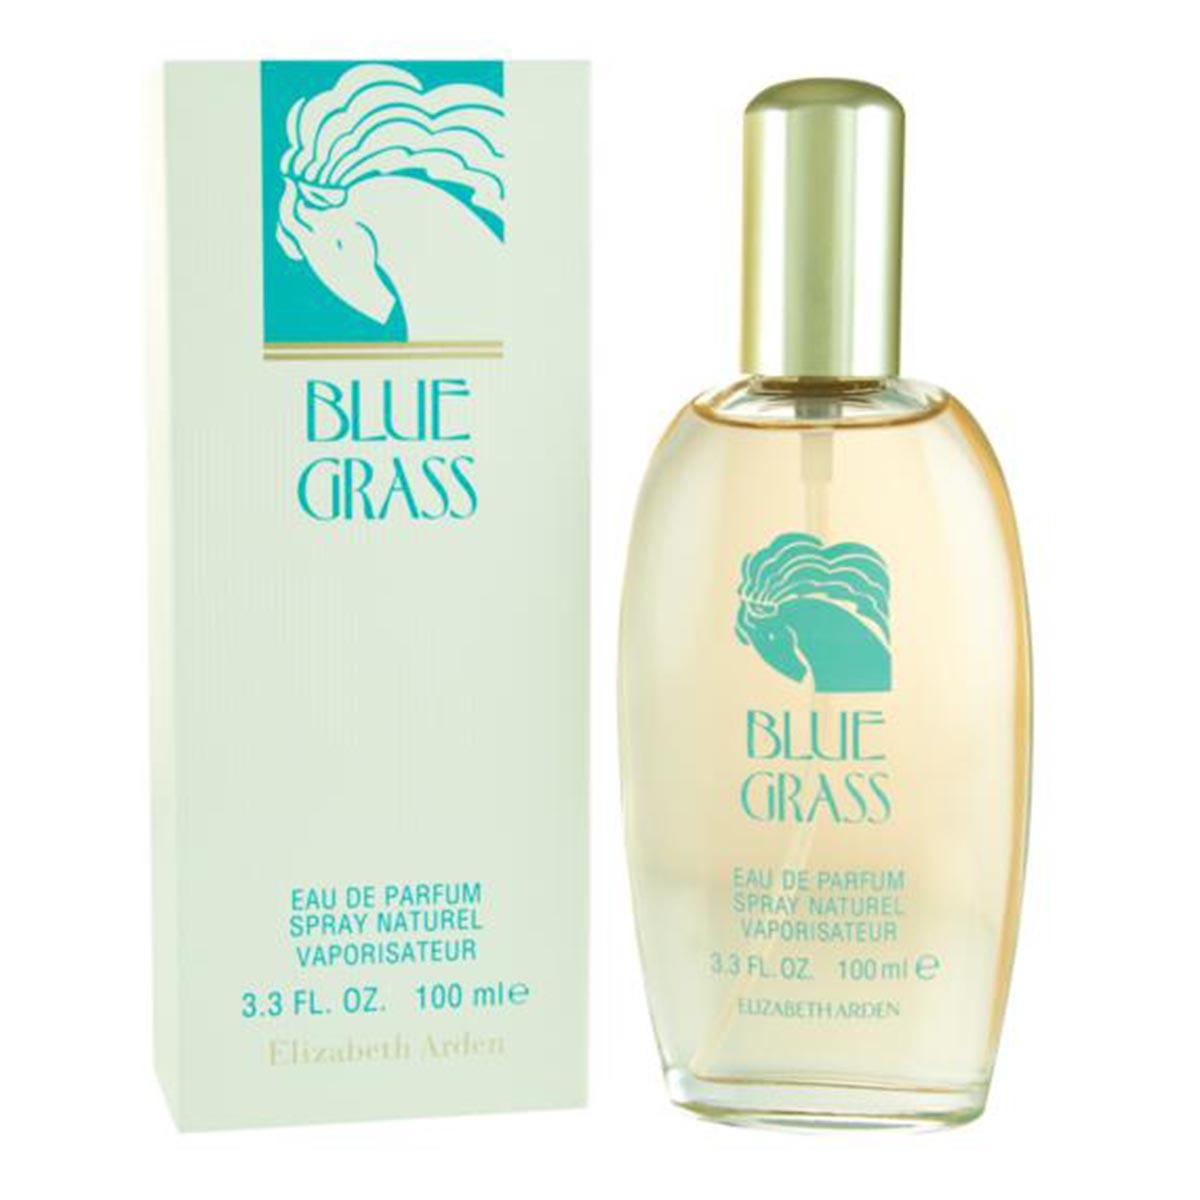 Elizabeth arden blue grass arden eau de parfum 100ml vaporizador